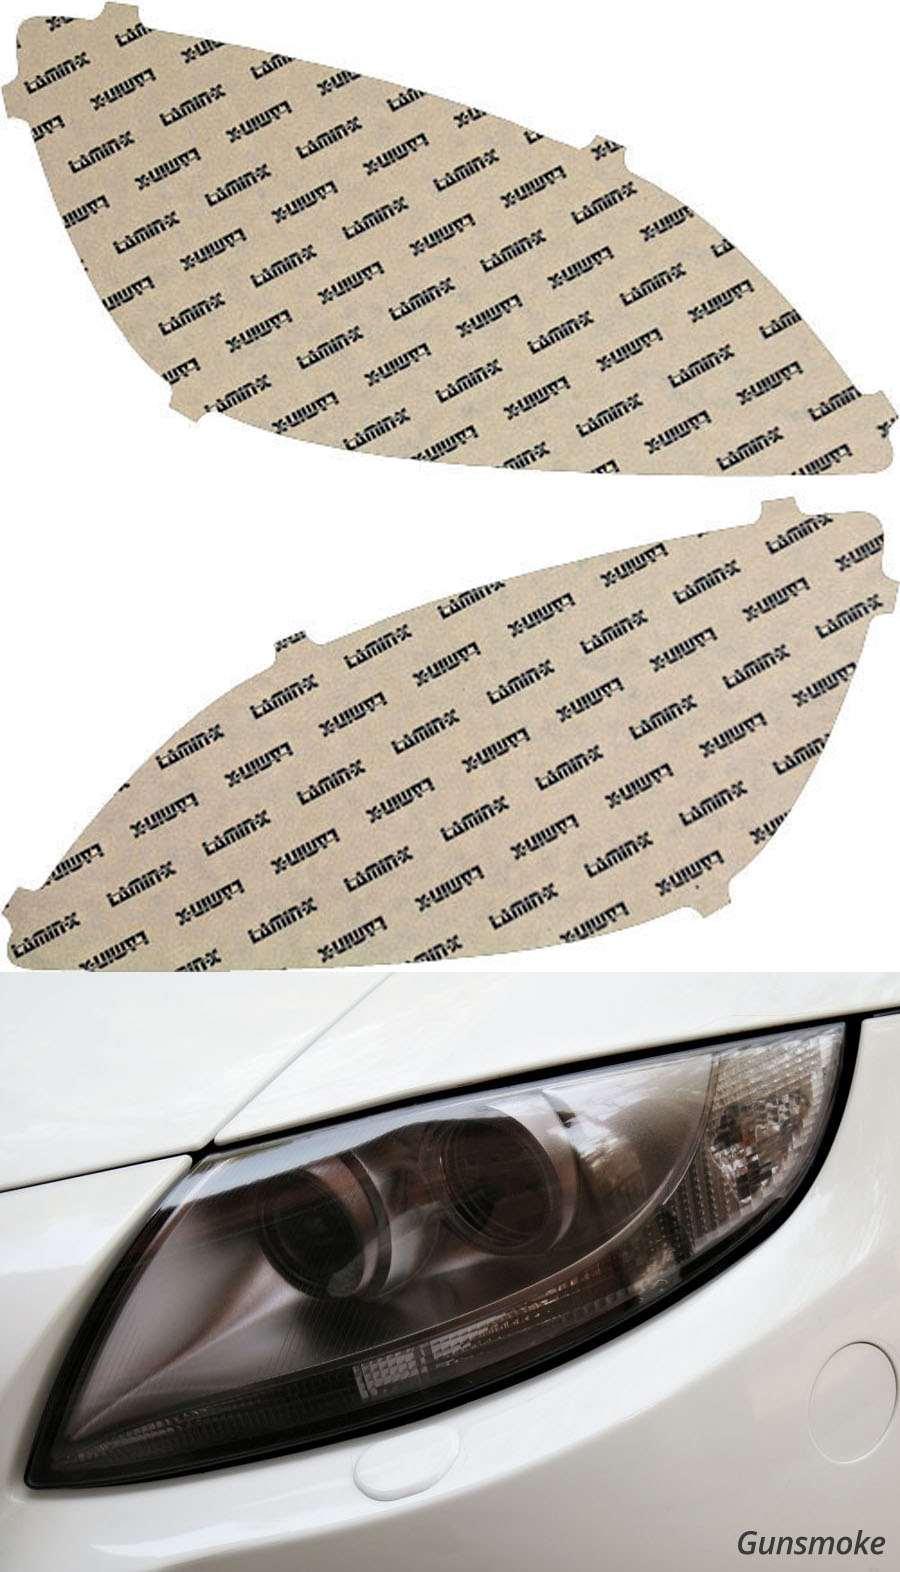 Buick Verano 12-17 Gunsmoke Headlight Covers Lamin-X BU004G